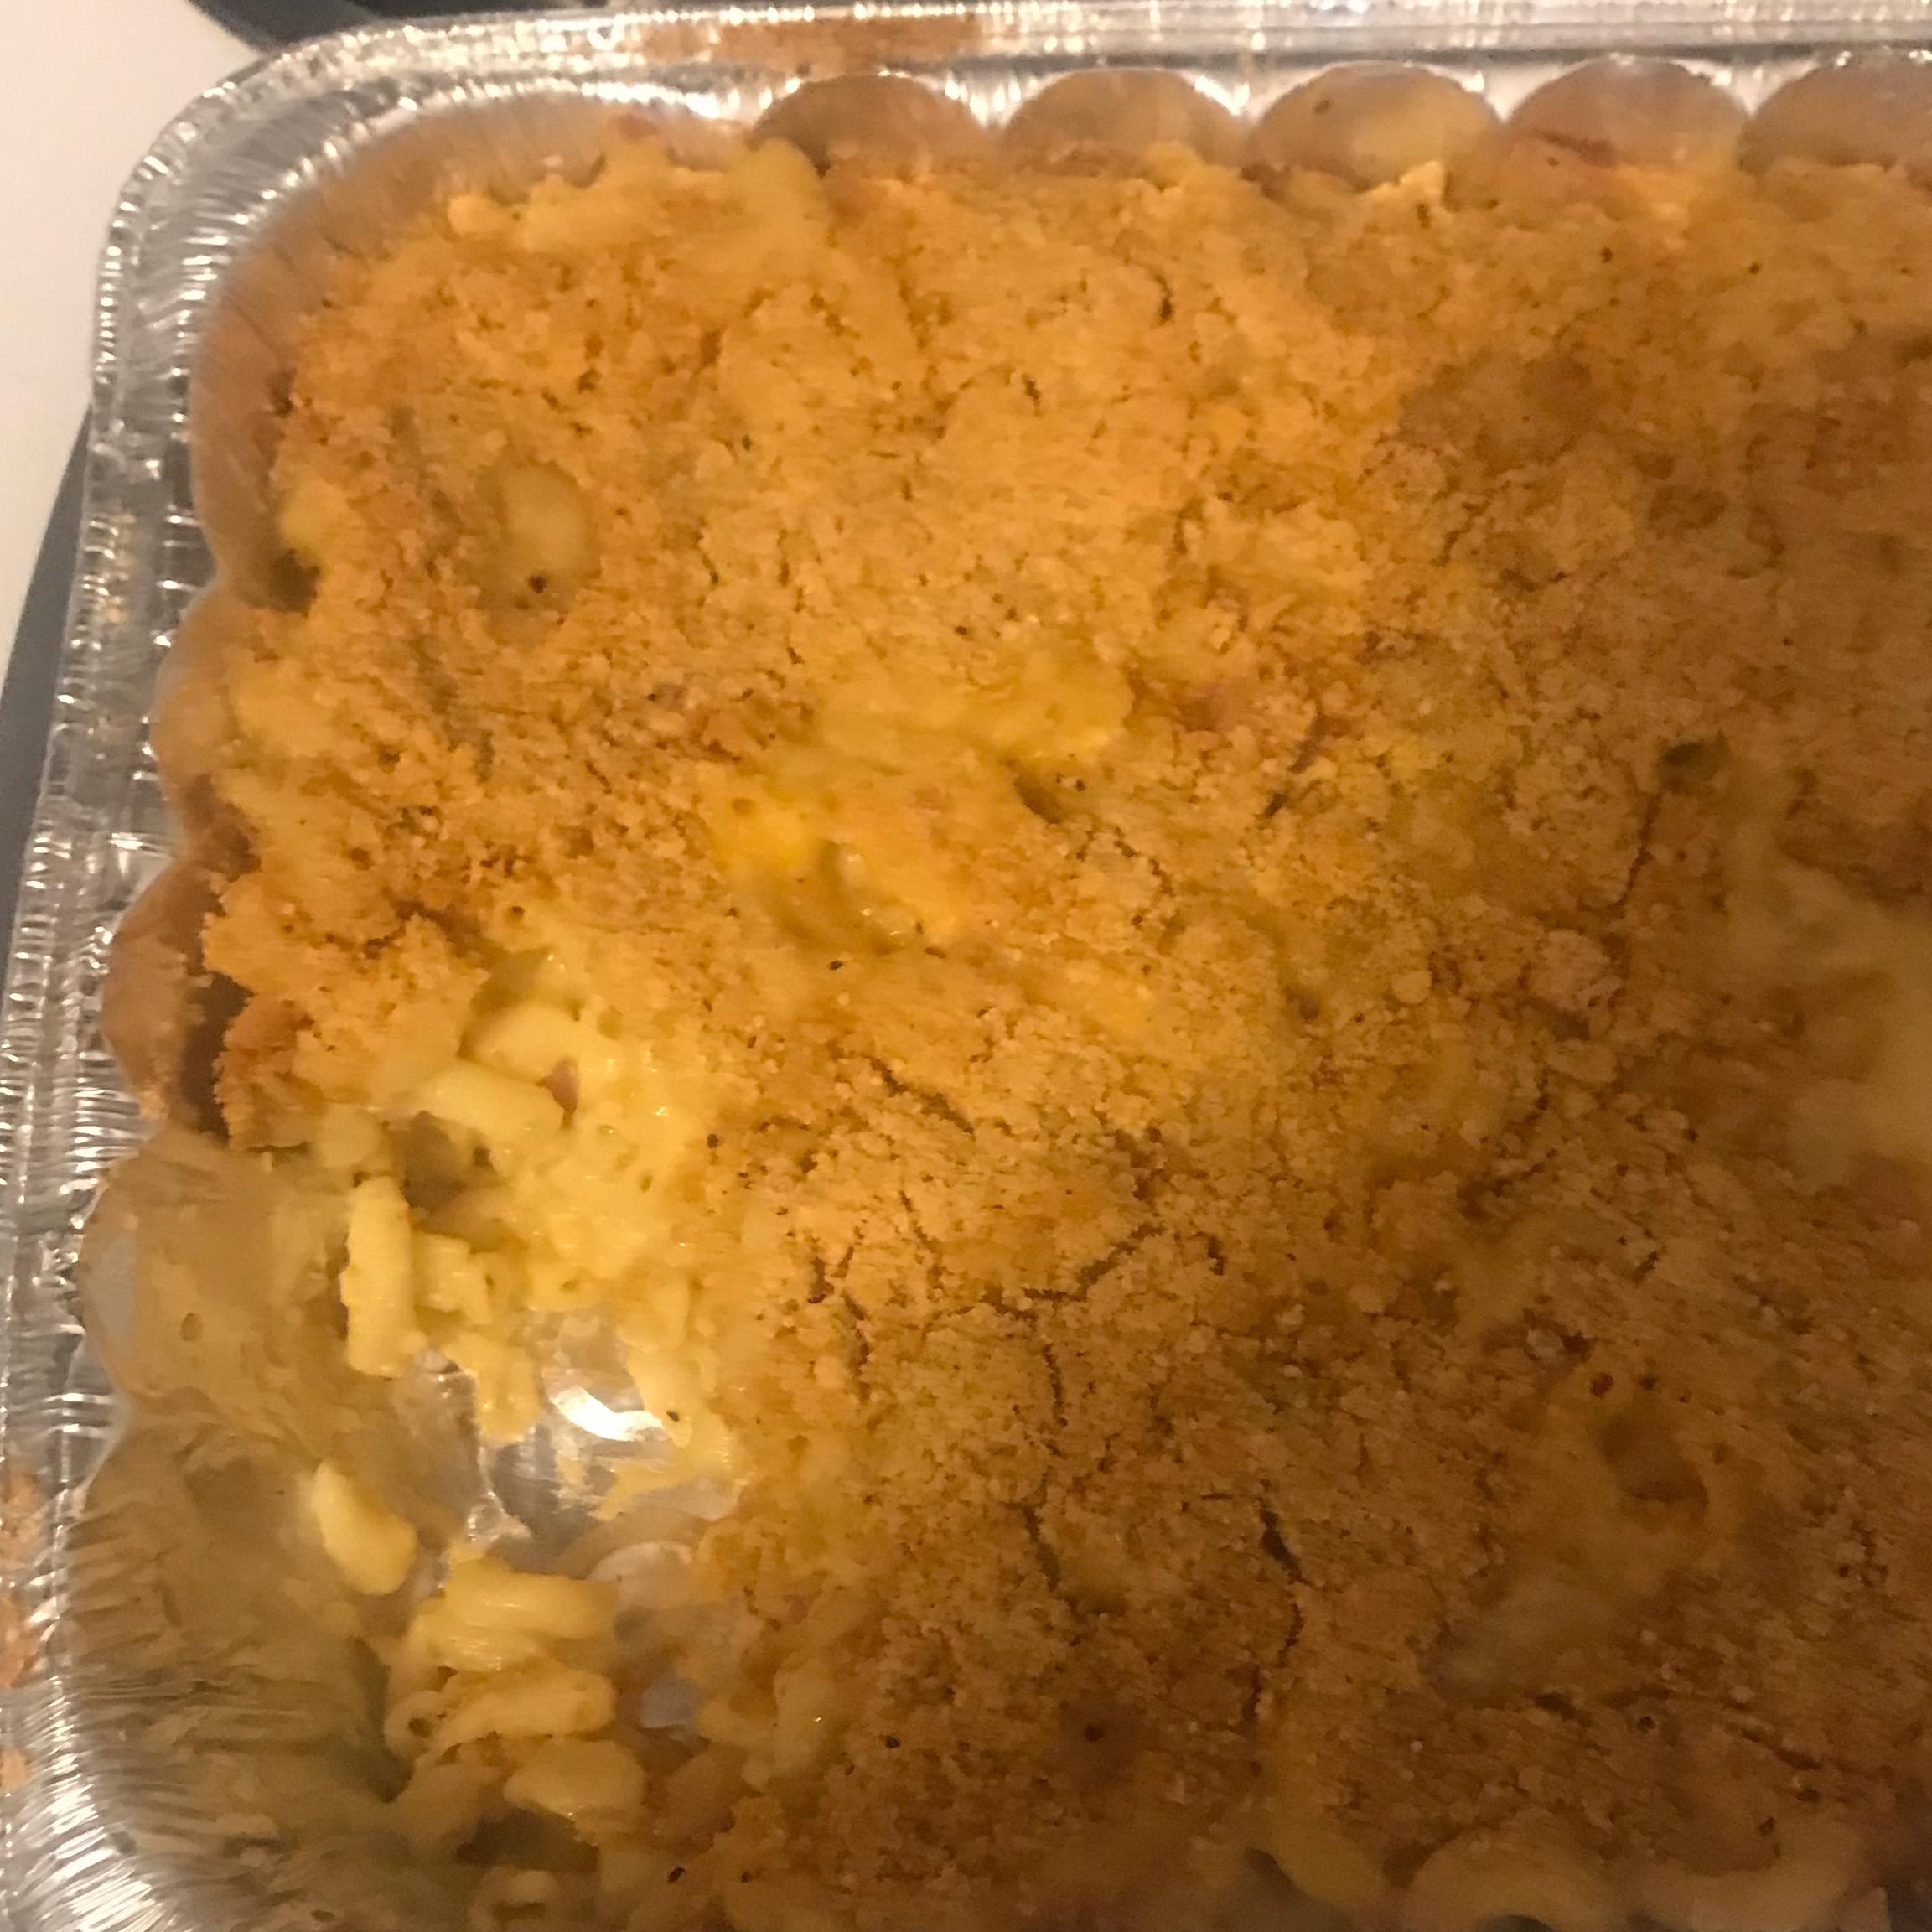 Healthier Homemade Mac and Cheese